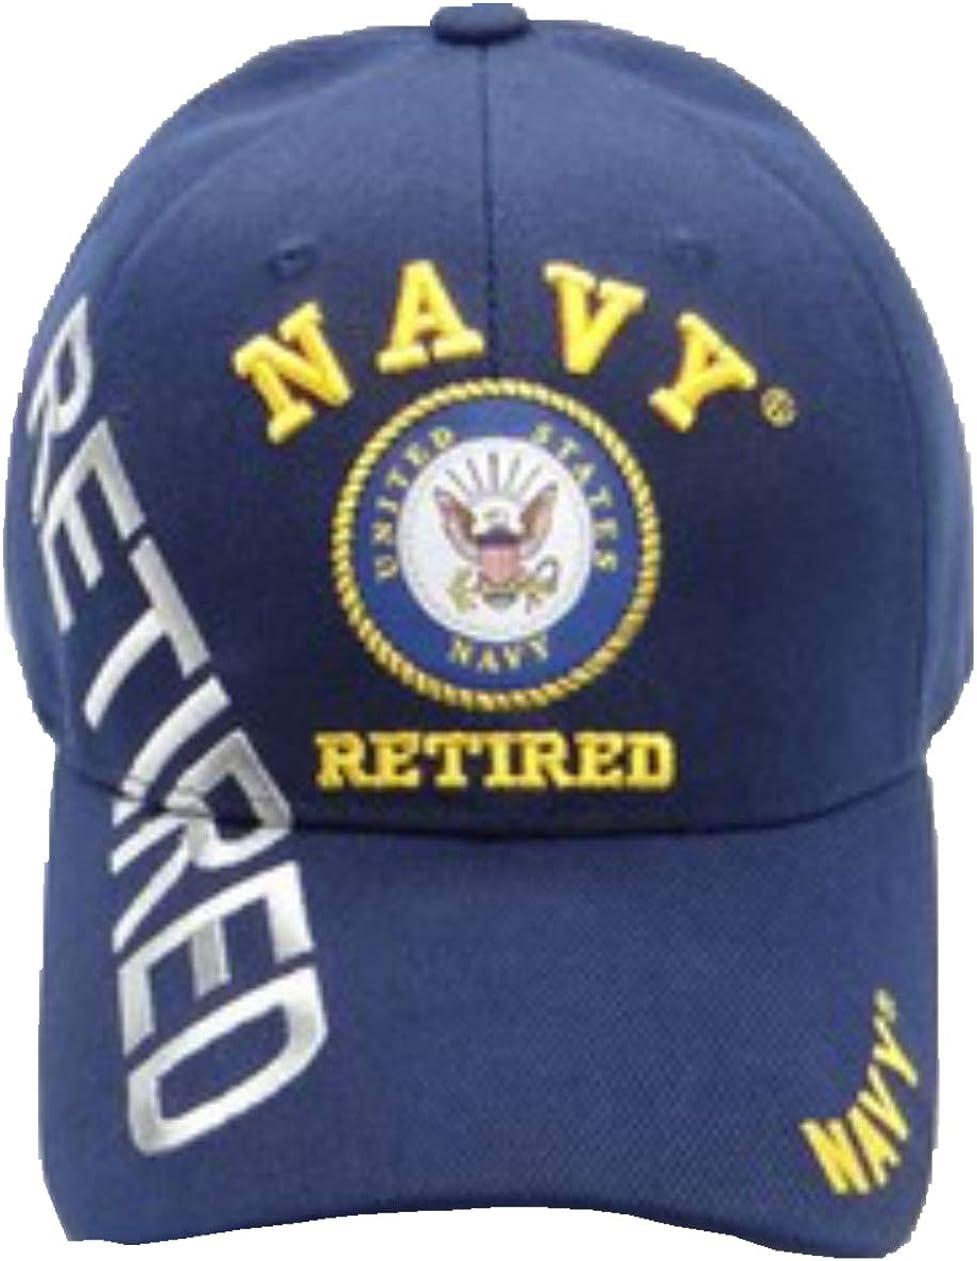 Navy Emblem Retired Retired Shadow Military Cap